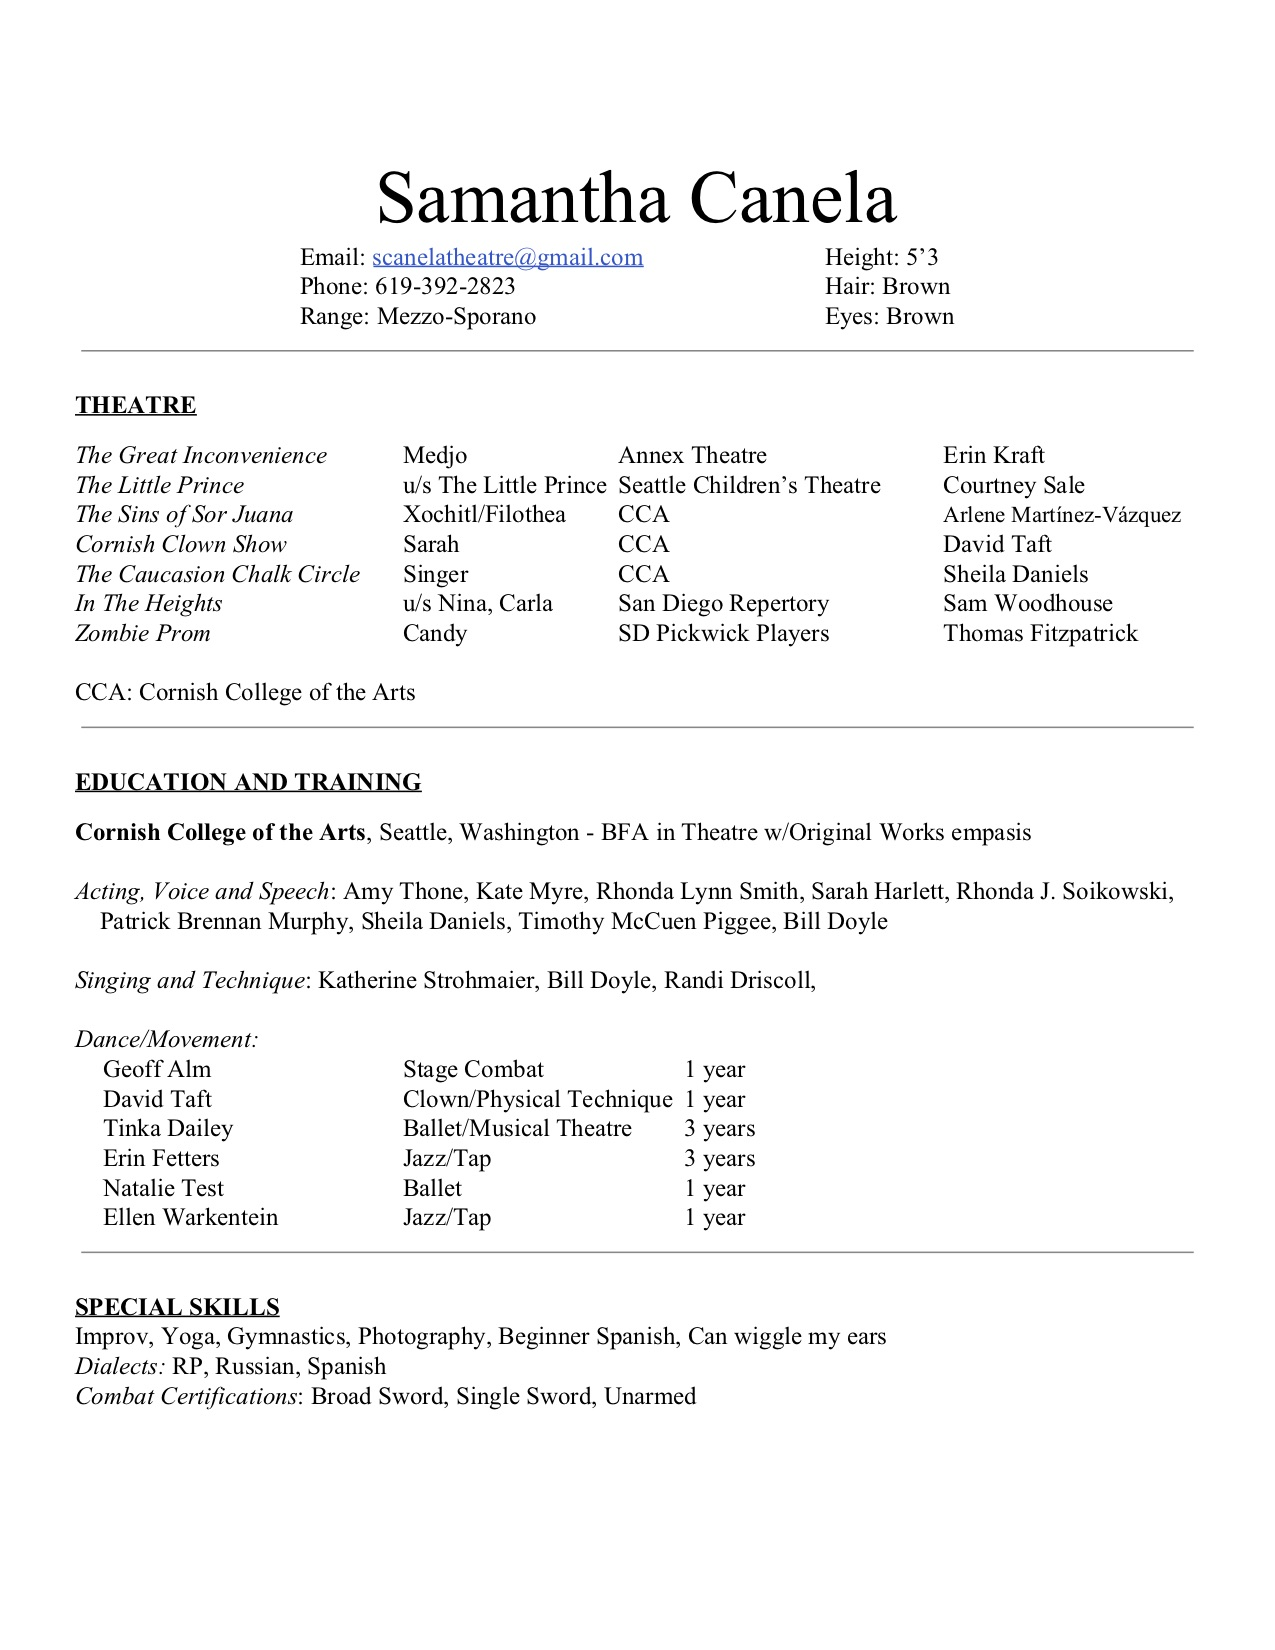 Theatre Resume - 9:10.jpg